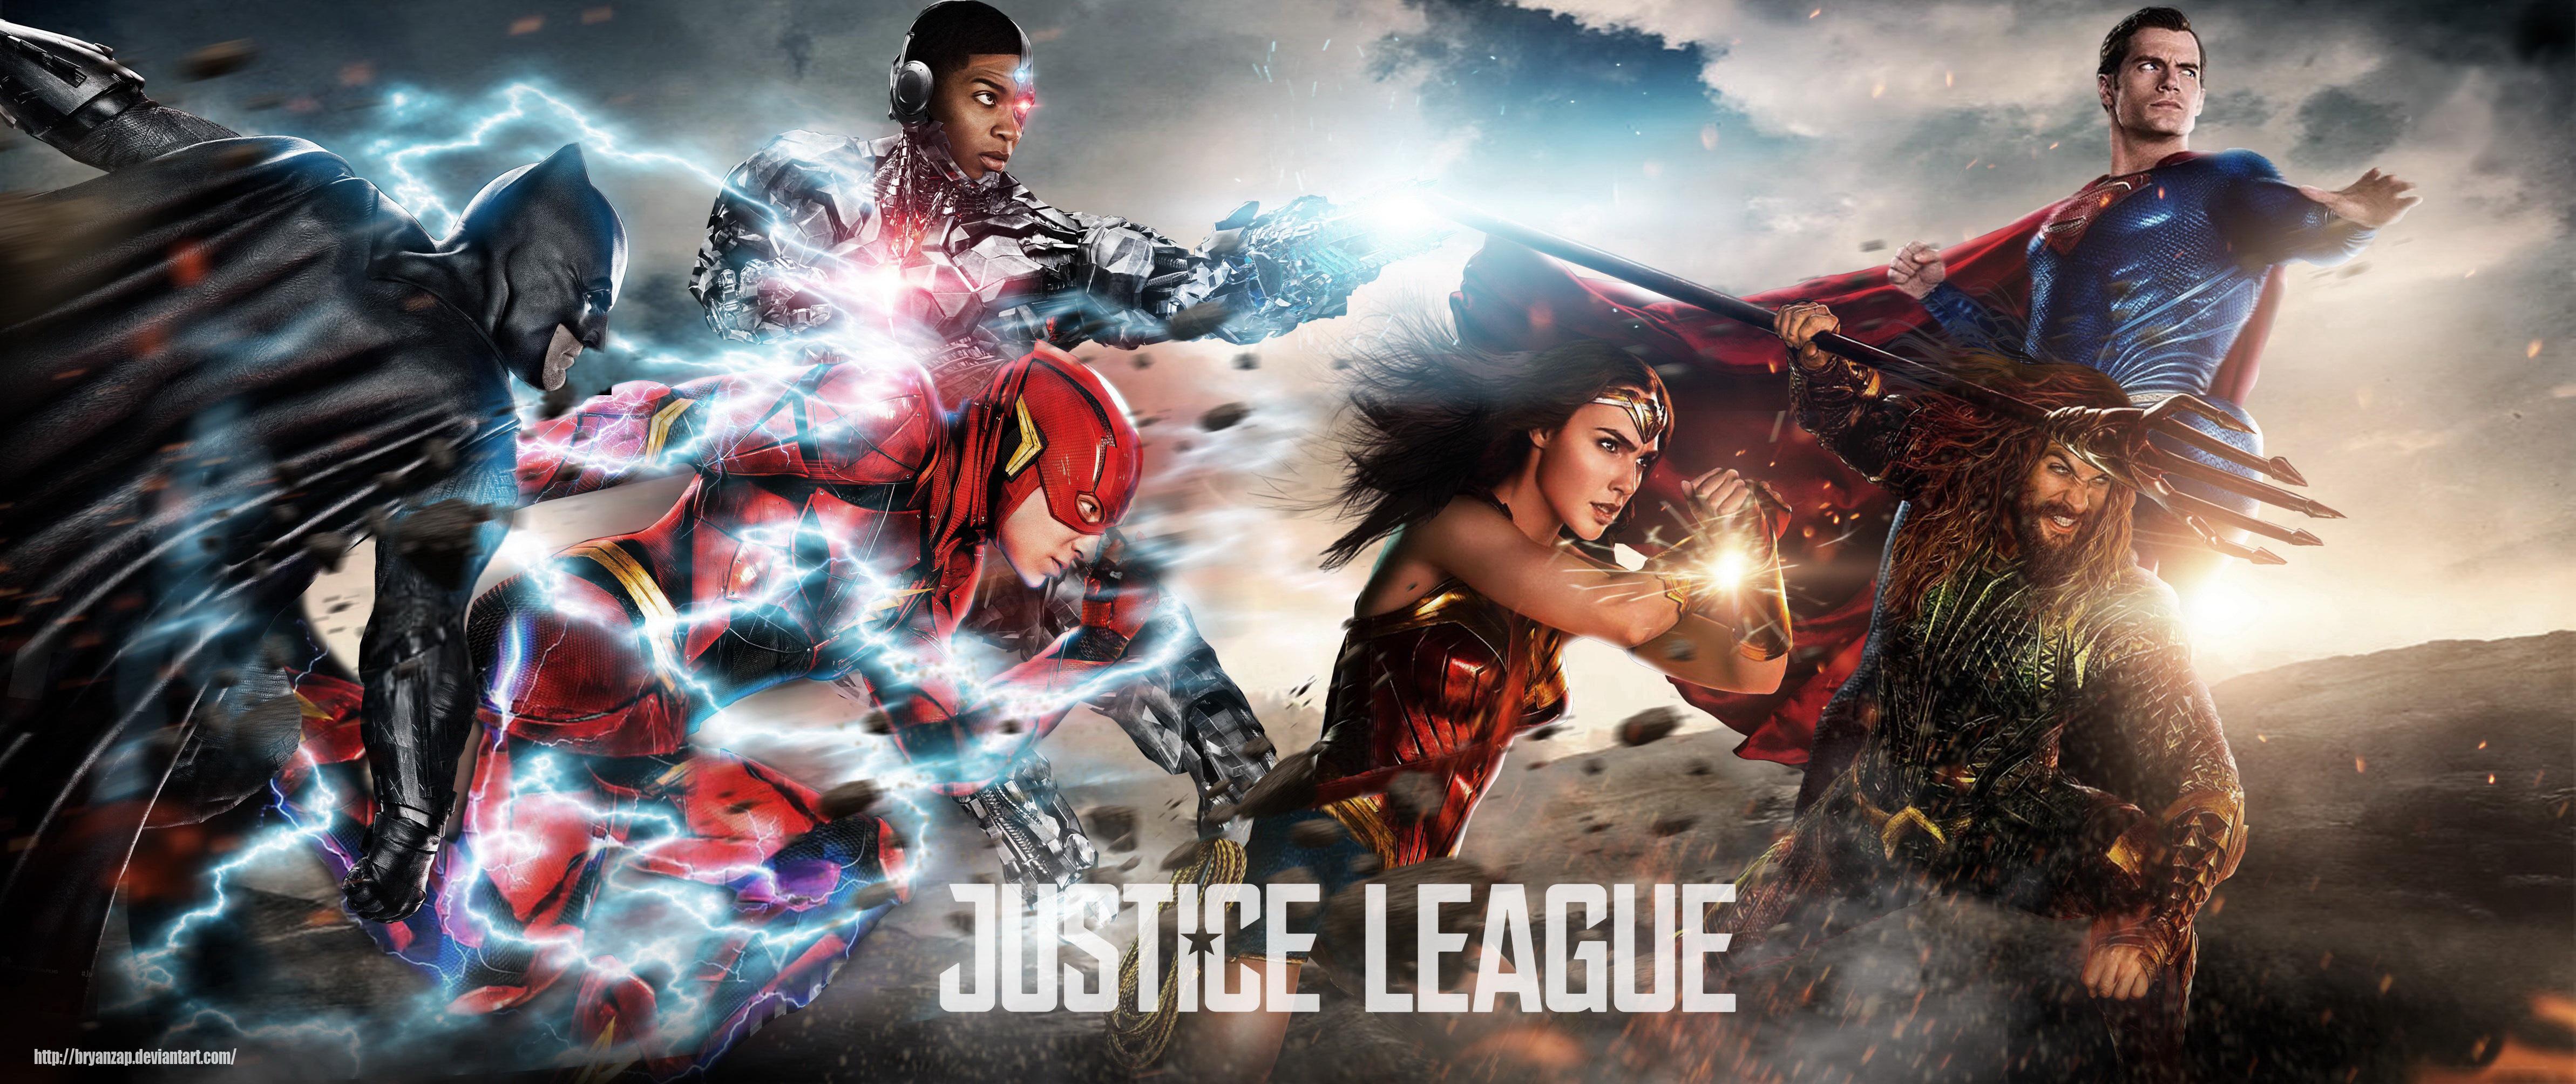 Justice League 2017 Movie 4k Hd Desktop Wallpaper For 4k: Justice League 2017 Fan Art, HD Movies, 4k Wallpapers